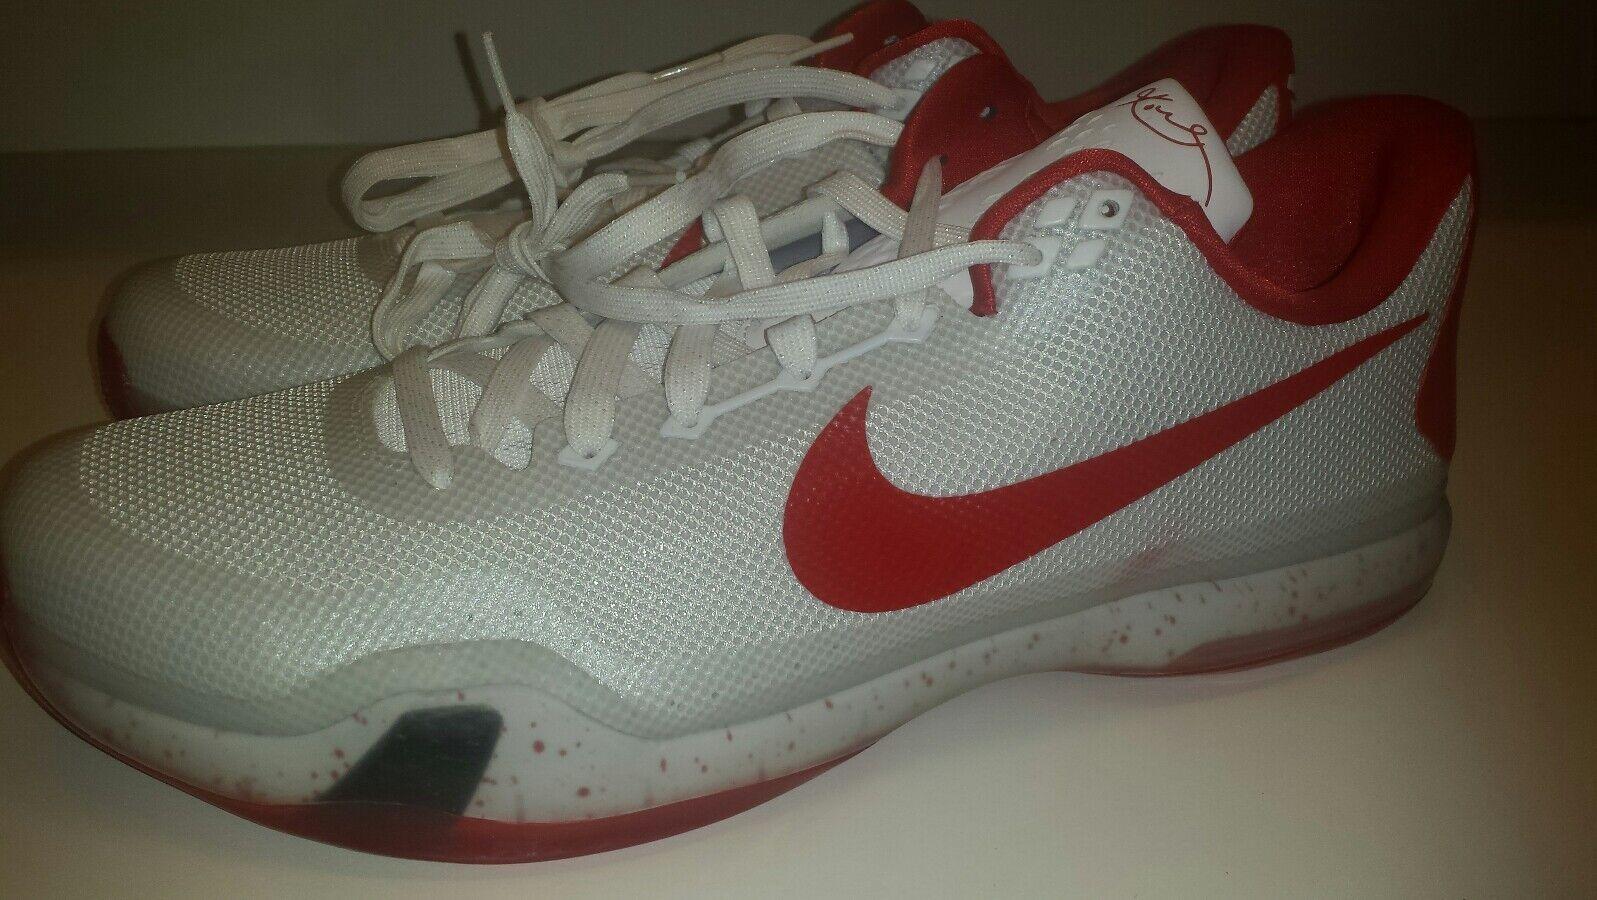 Nike Kobe X 10 TB White Red Comfortable